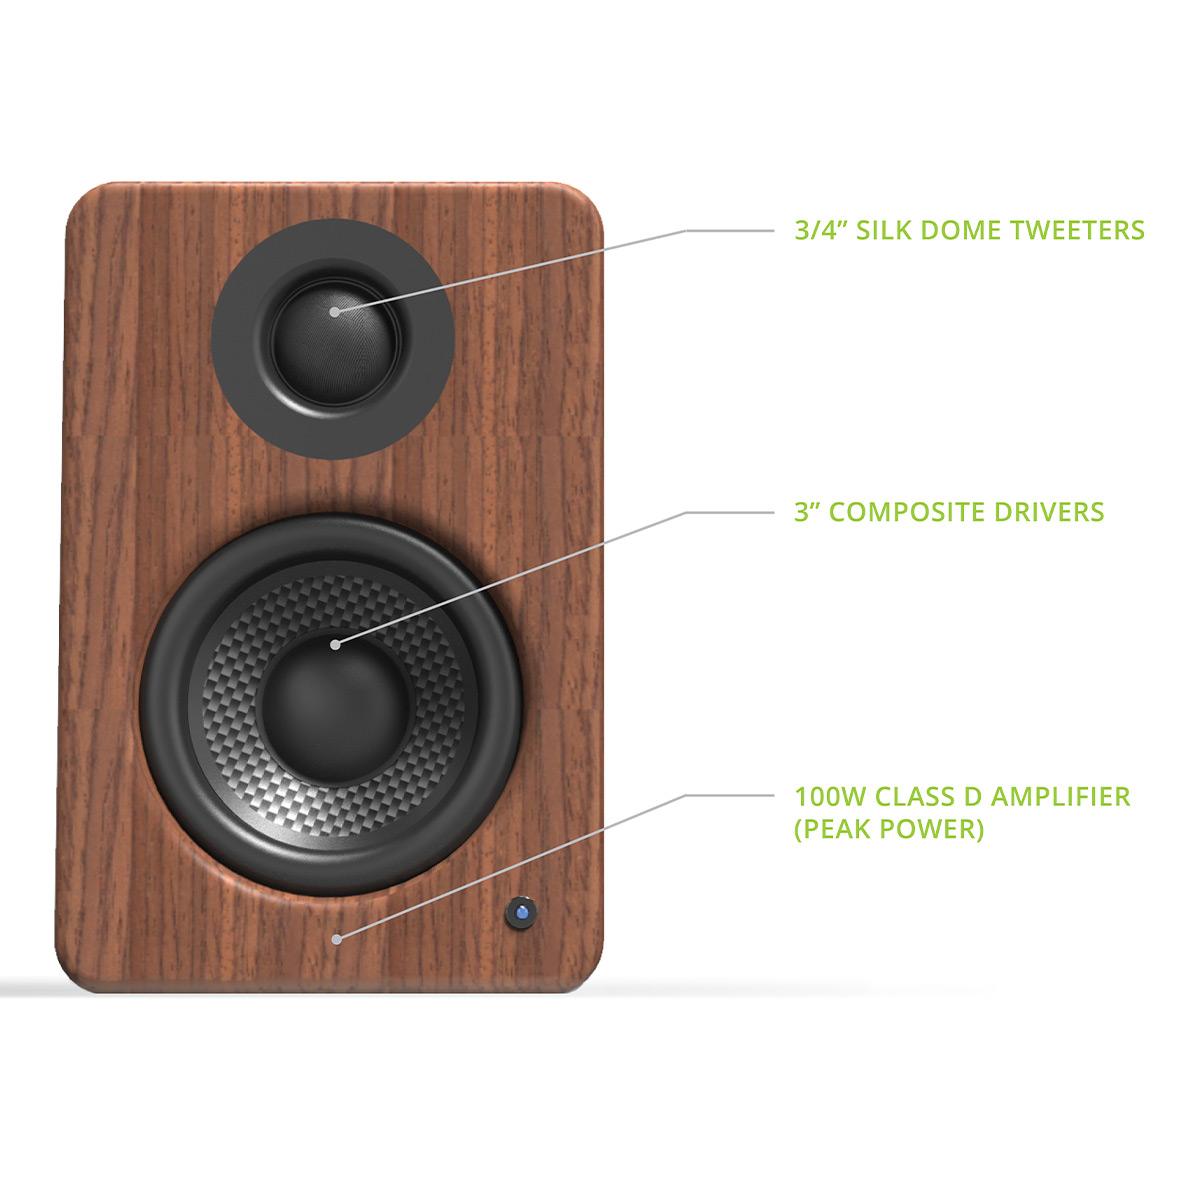 thumbnail 15 - Kanto YU2 Powered Desktop Speakers - Pair